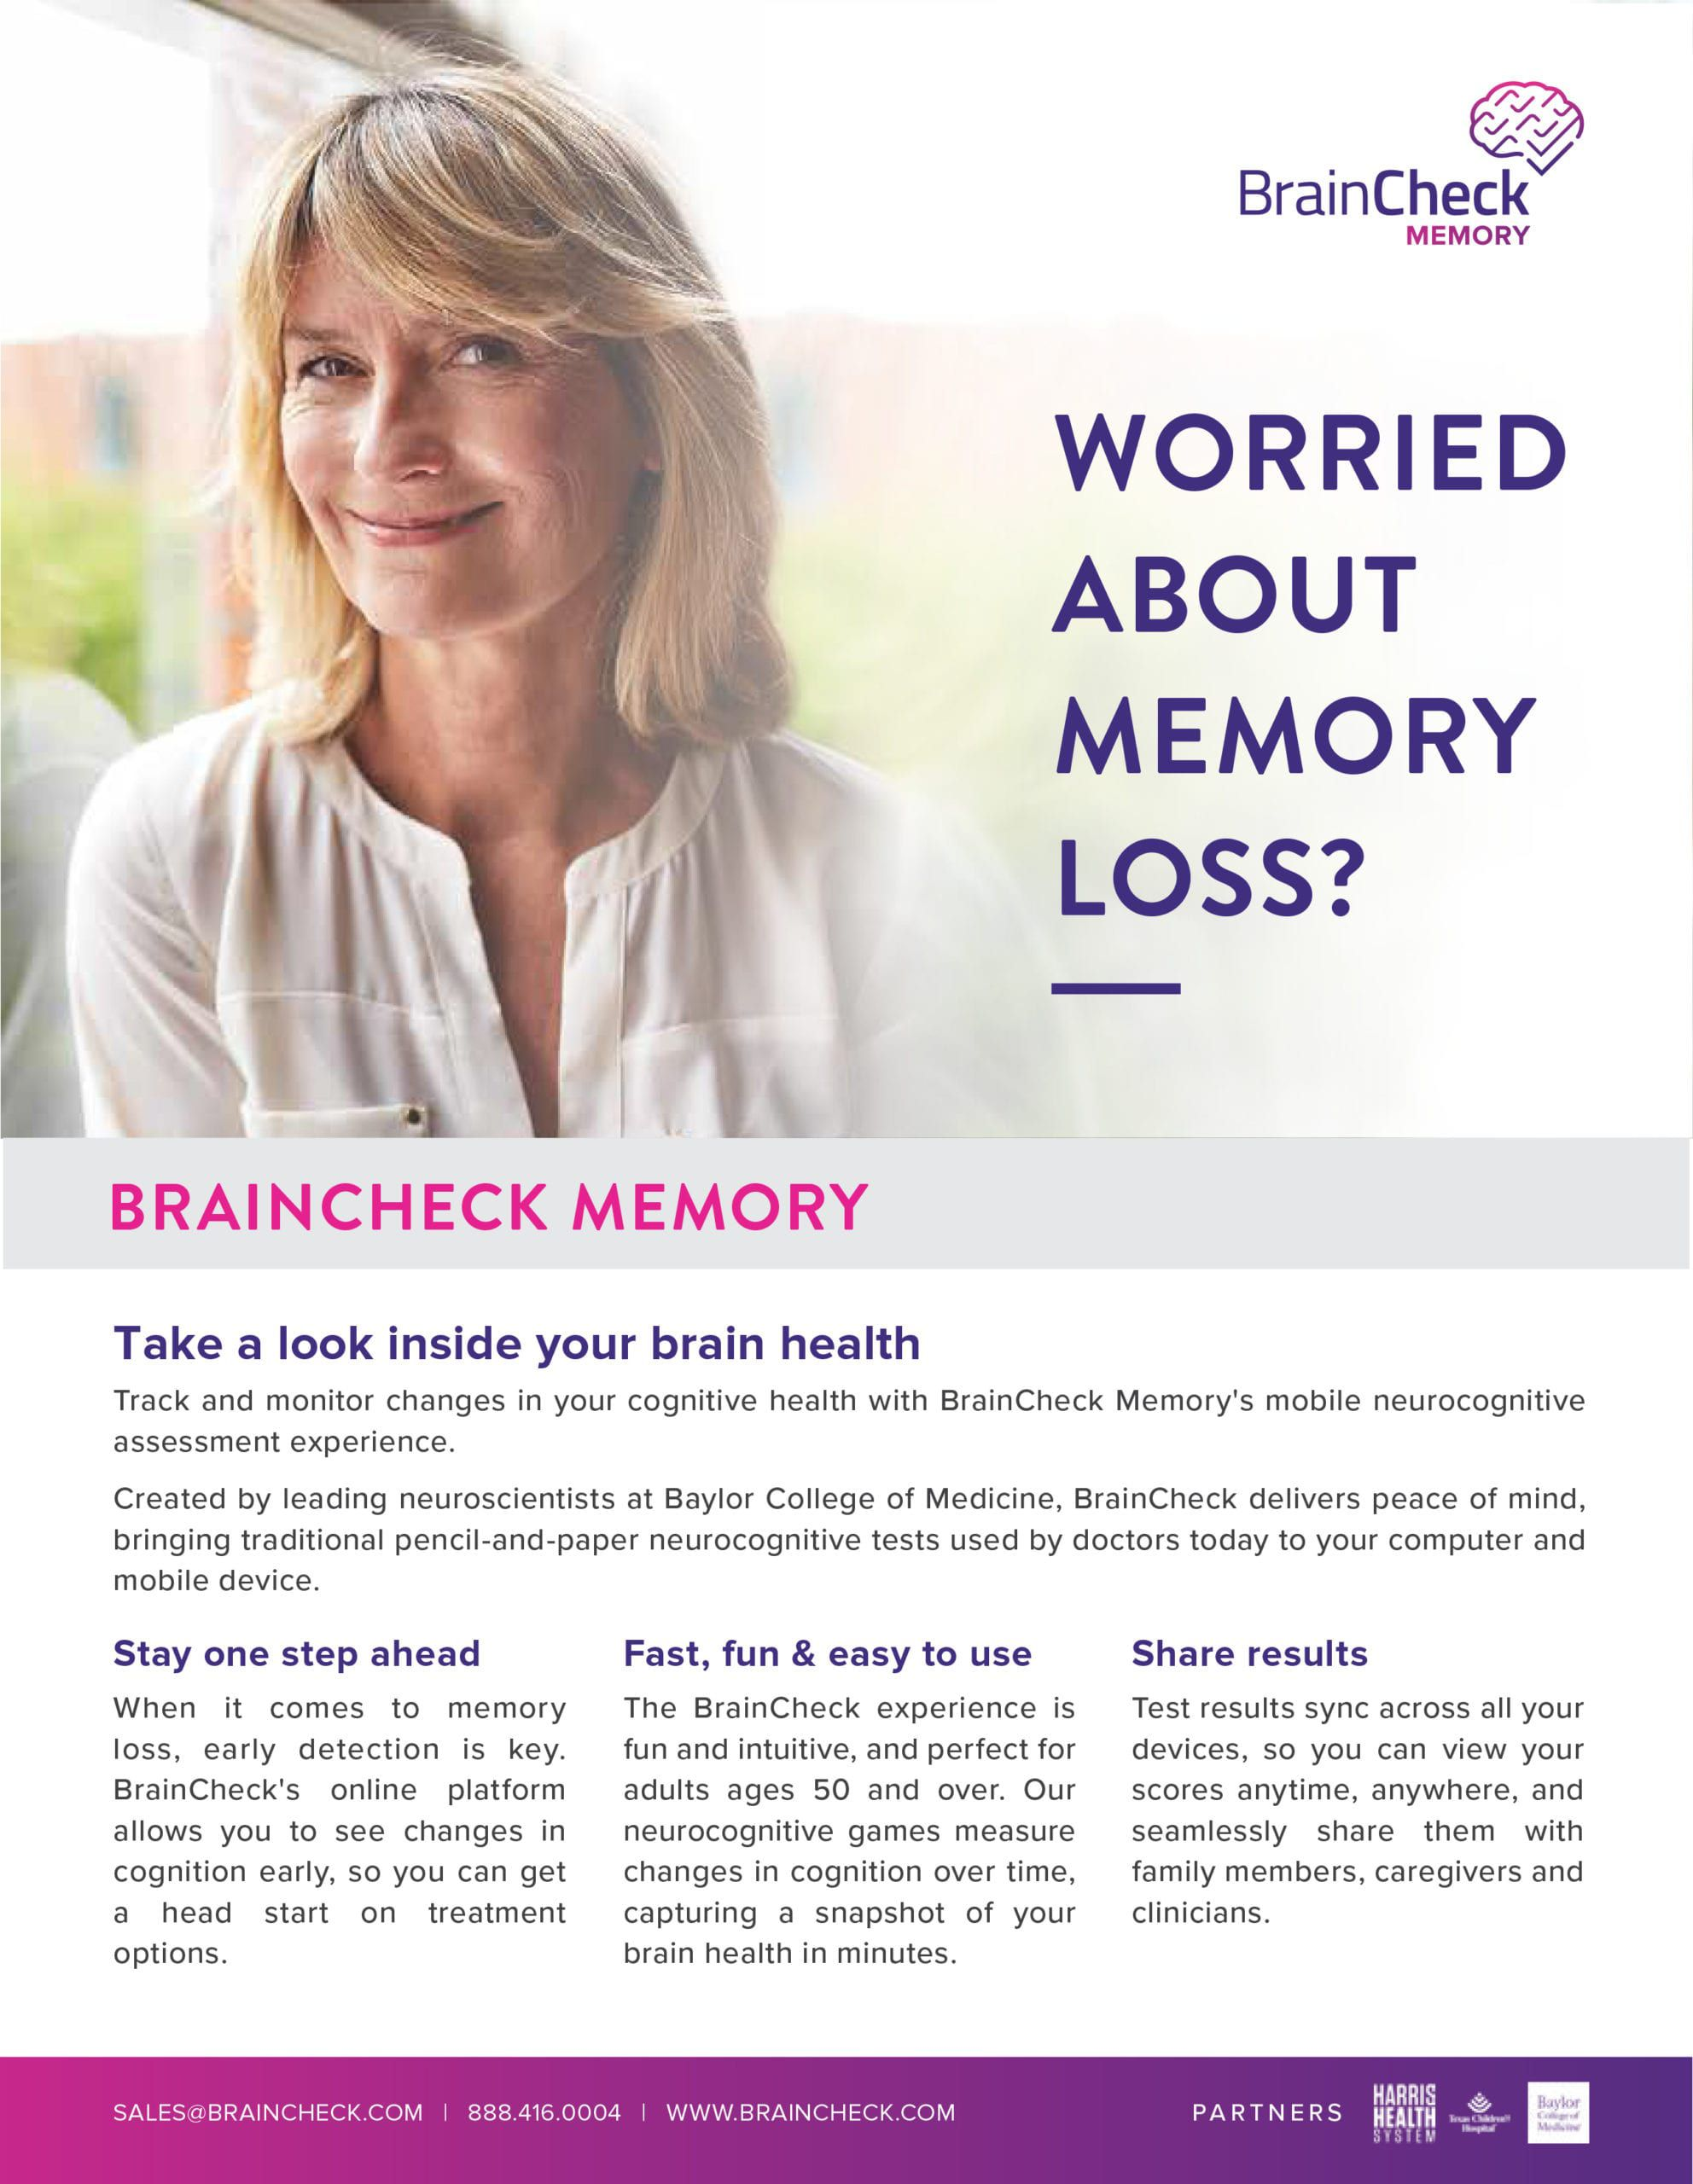 Brain Check Memory Article